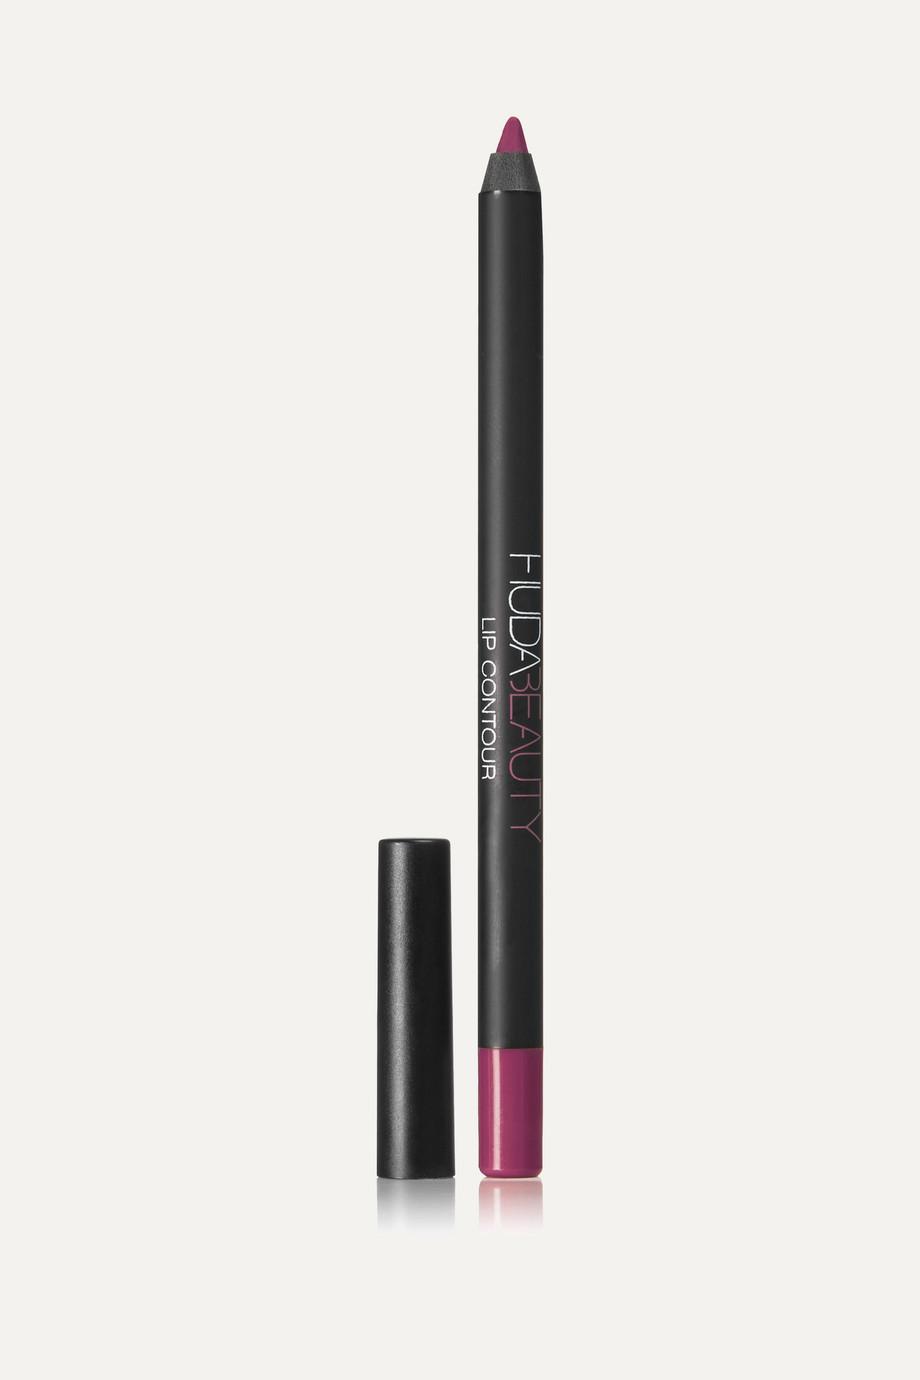 Huda Beauty Lip Contour - Famous